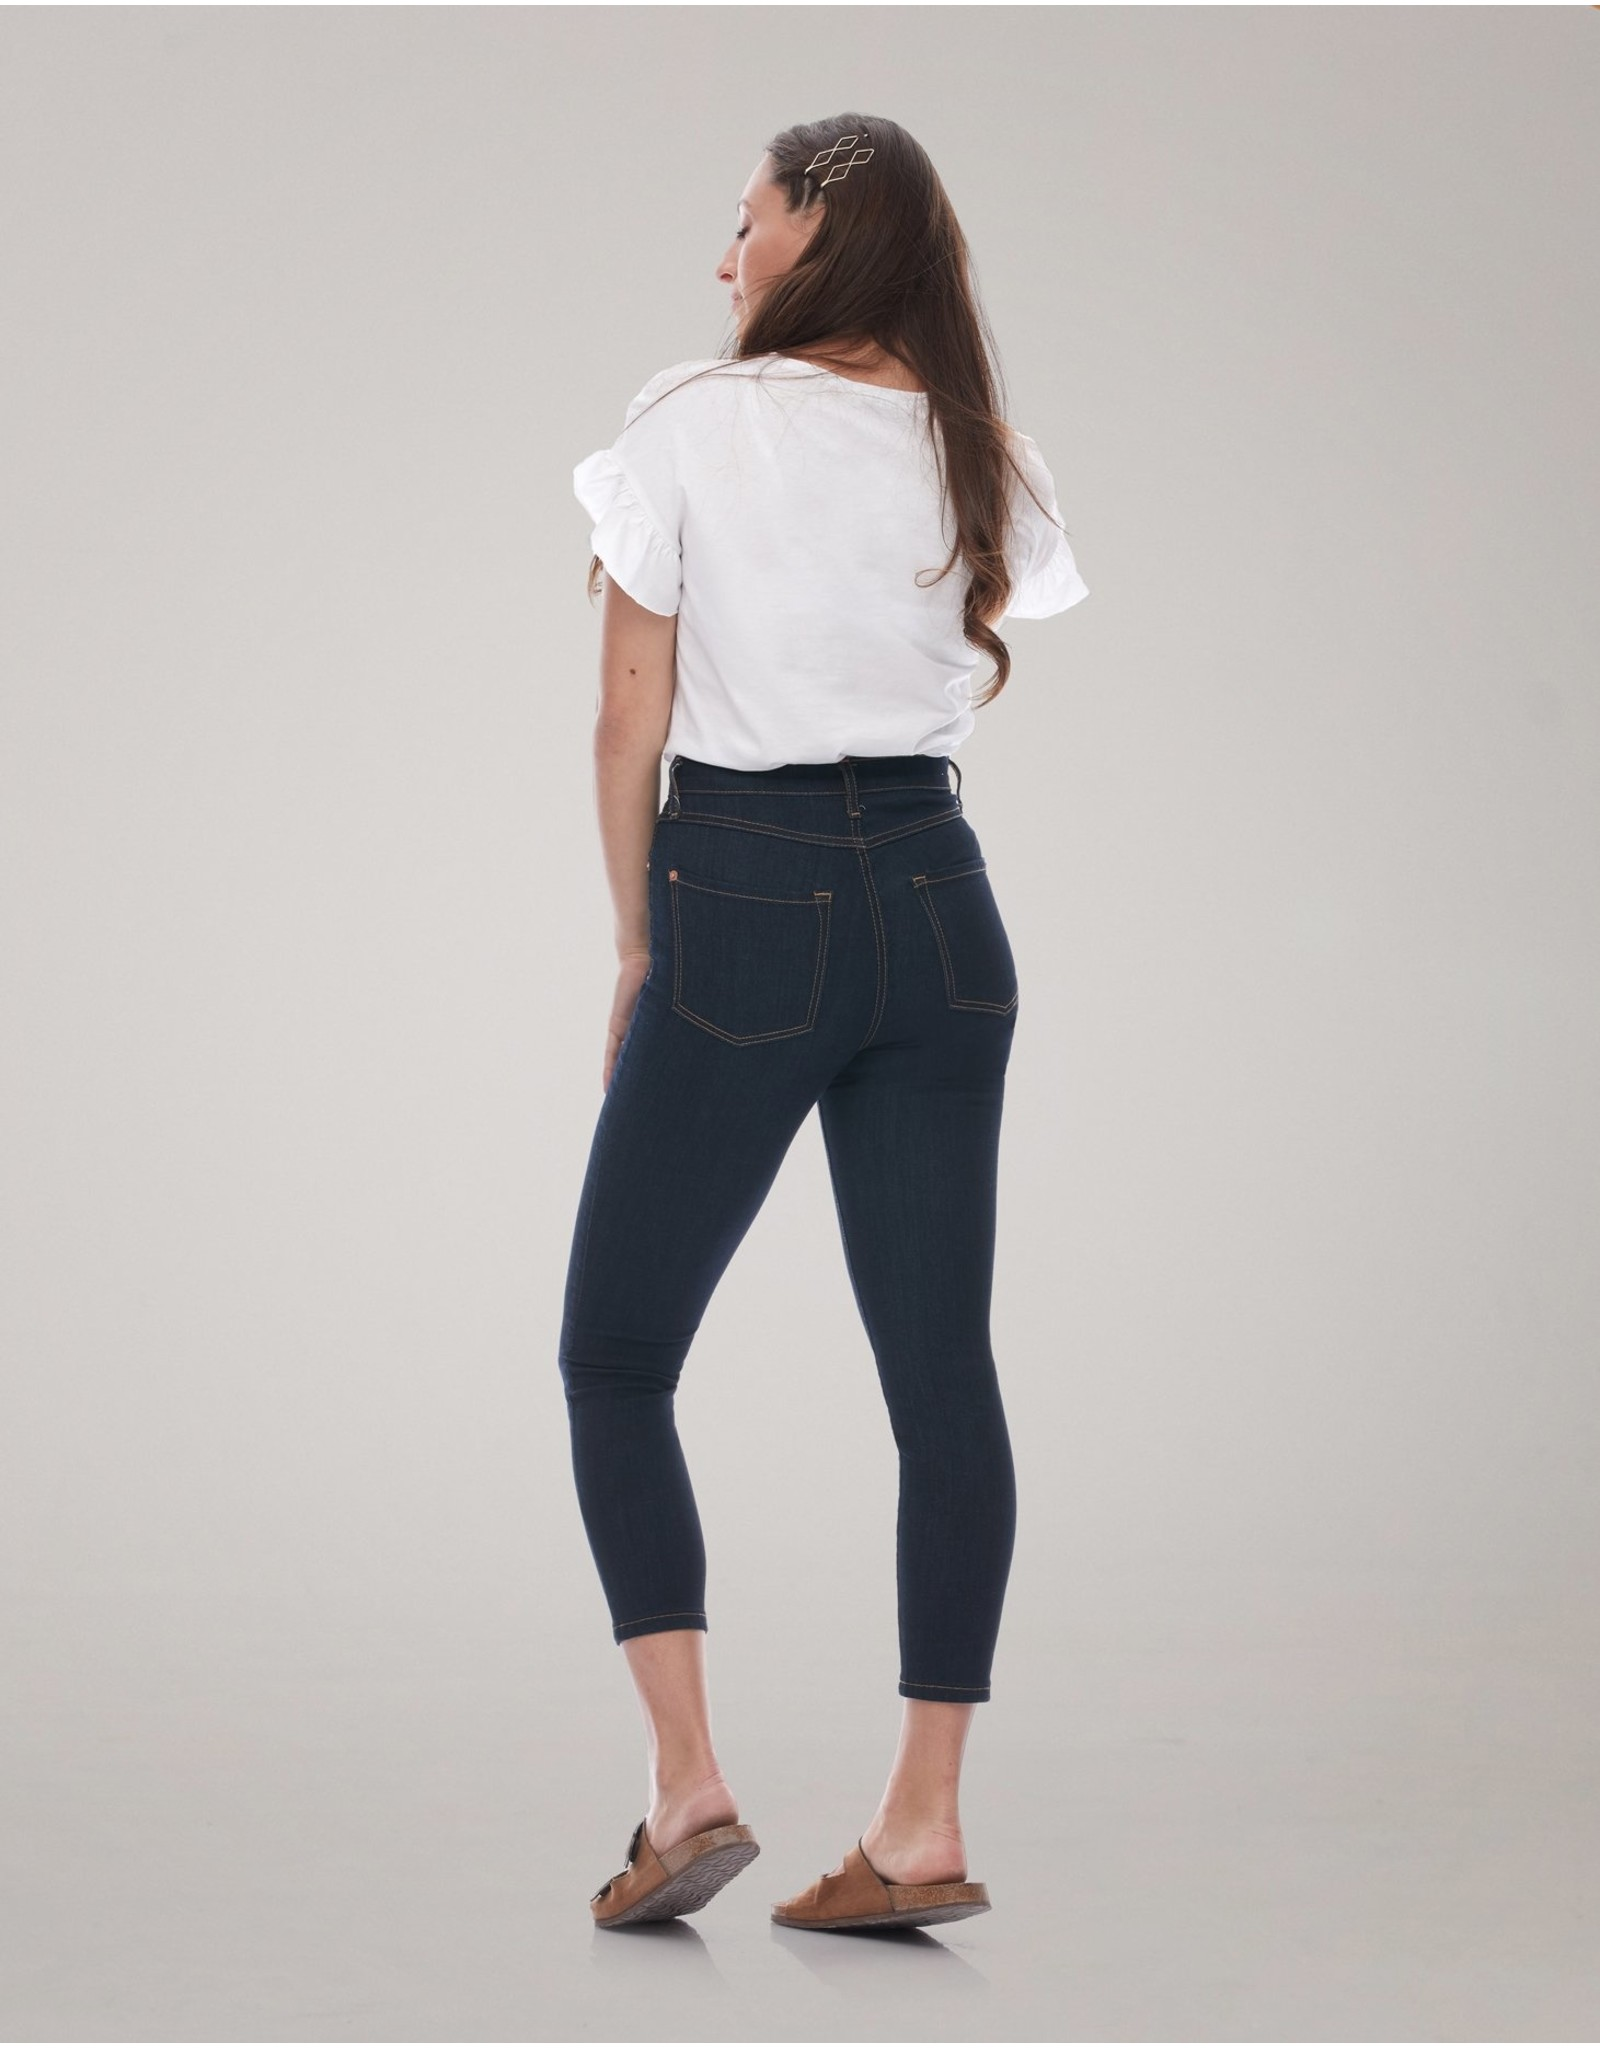 Yoga Jeans Rachel Manhattan